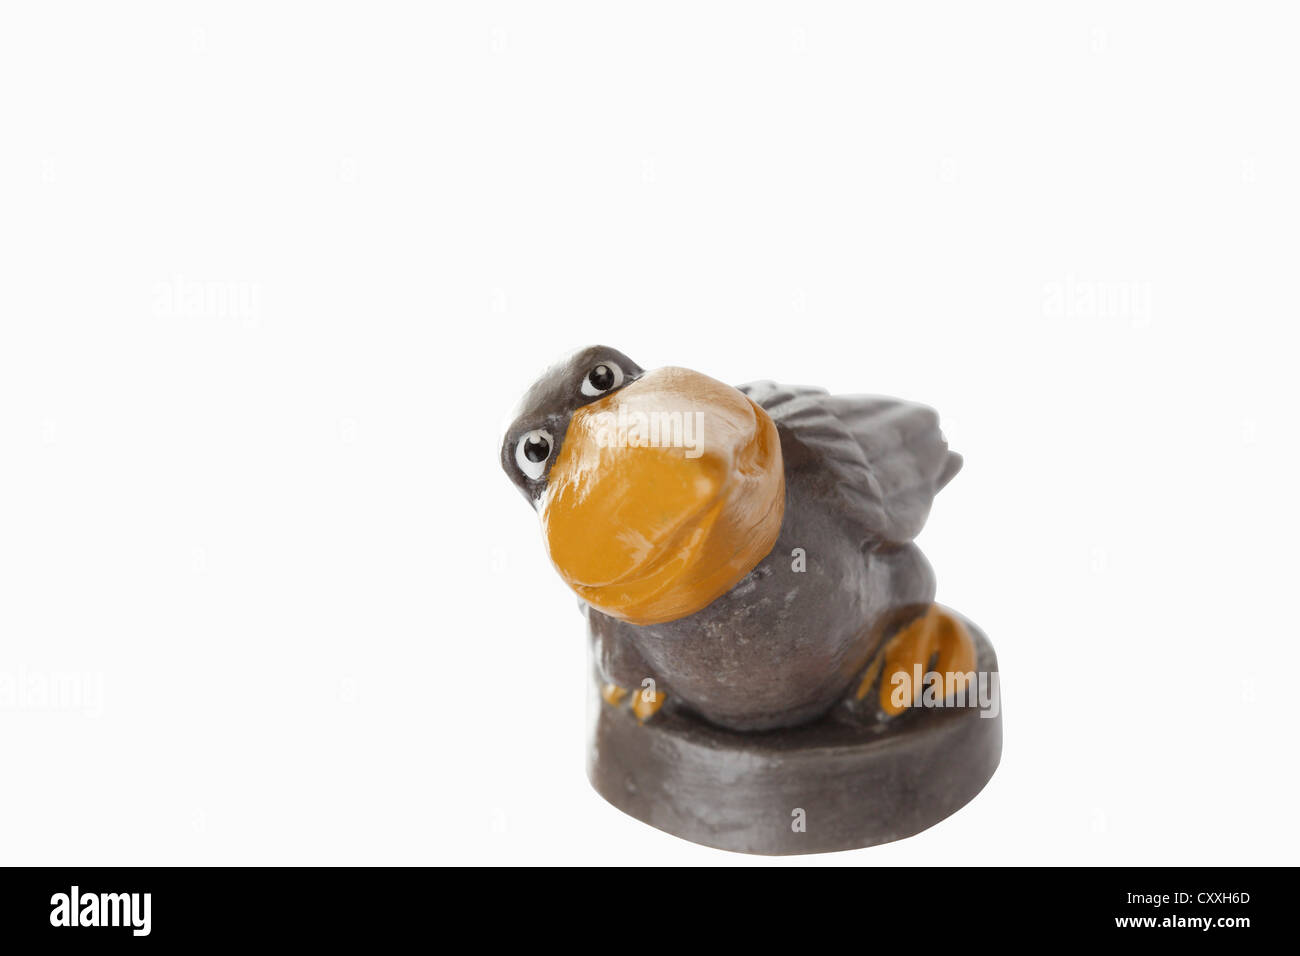 cartoon character bird with large beak stock photo royalty free